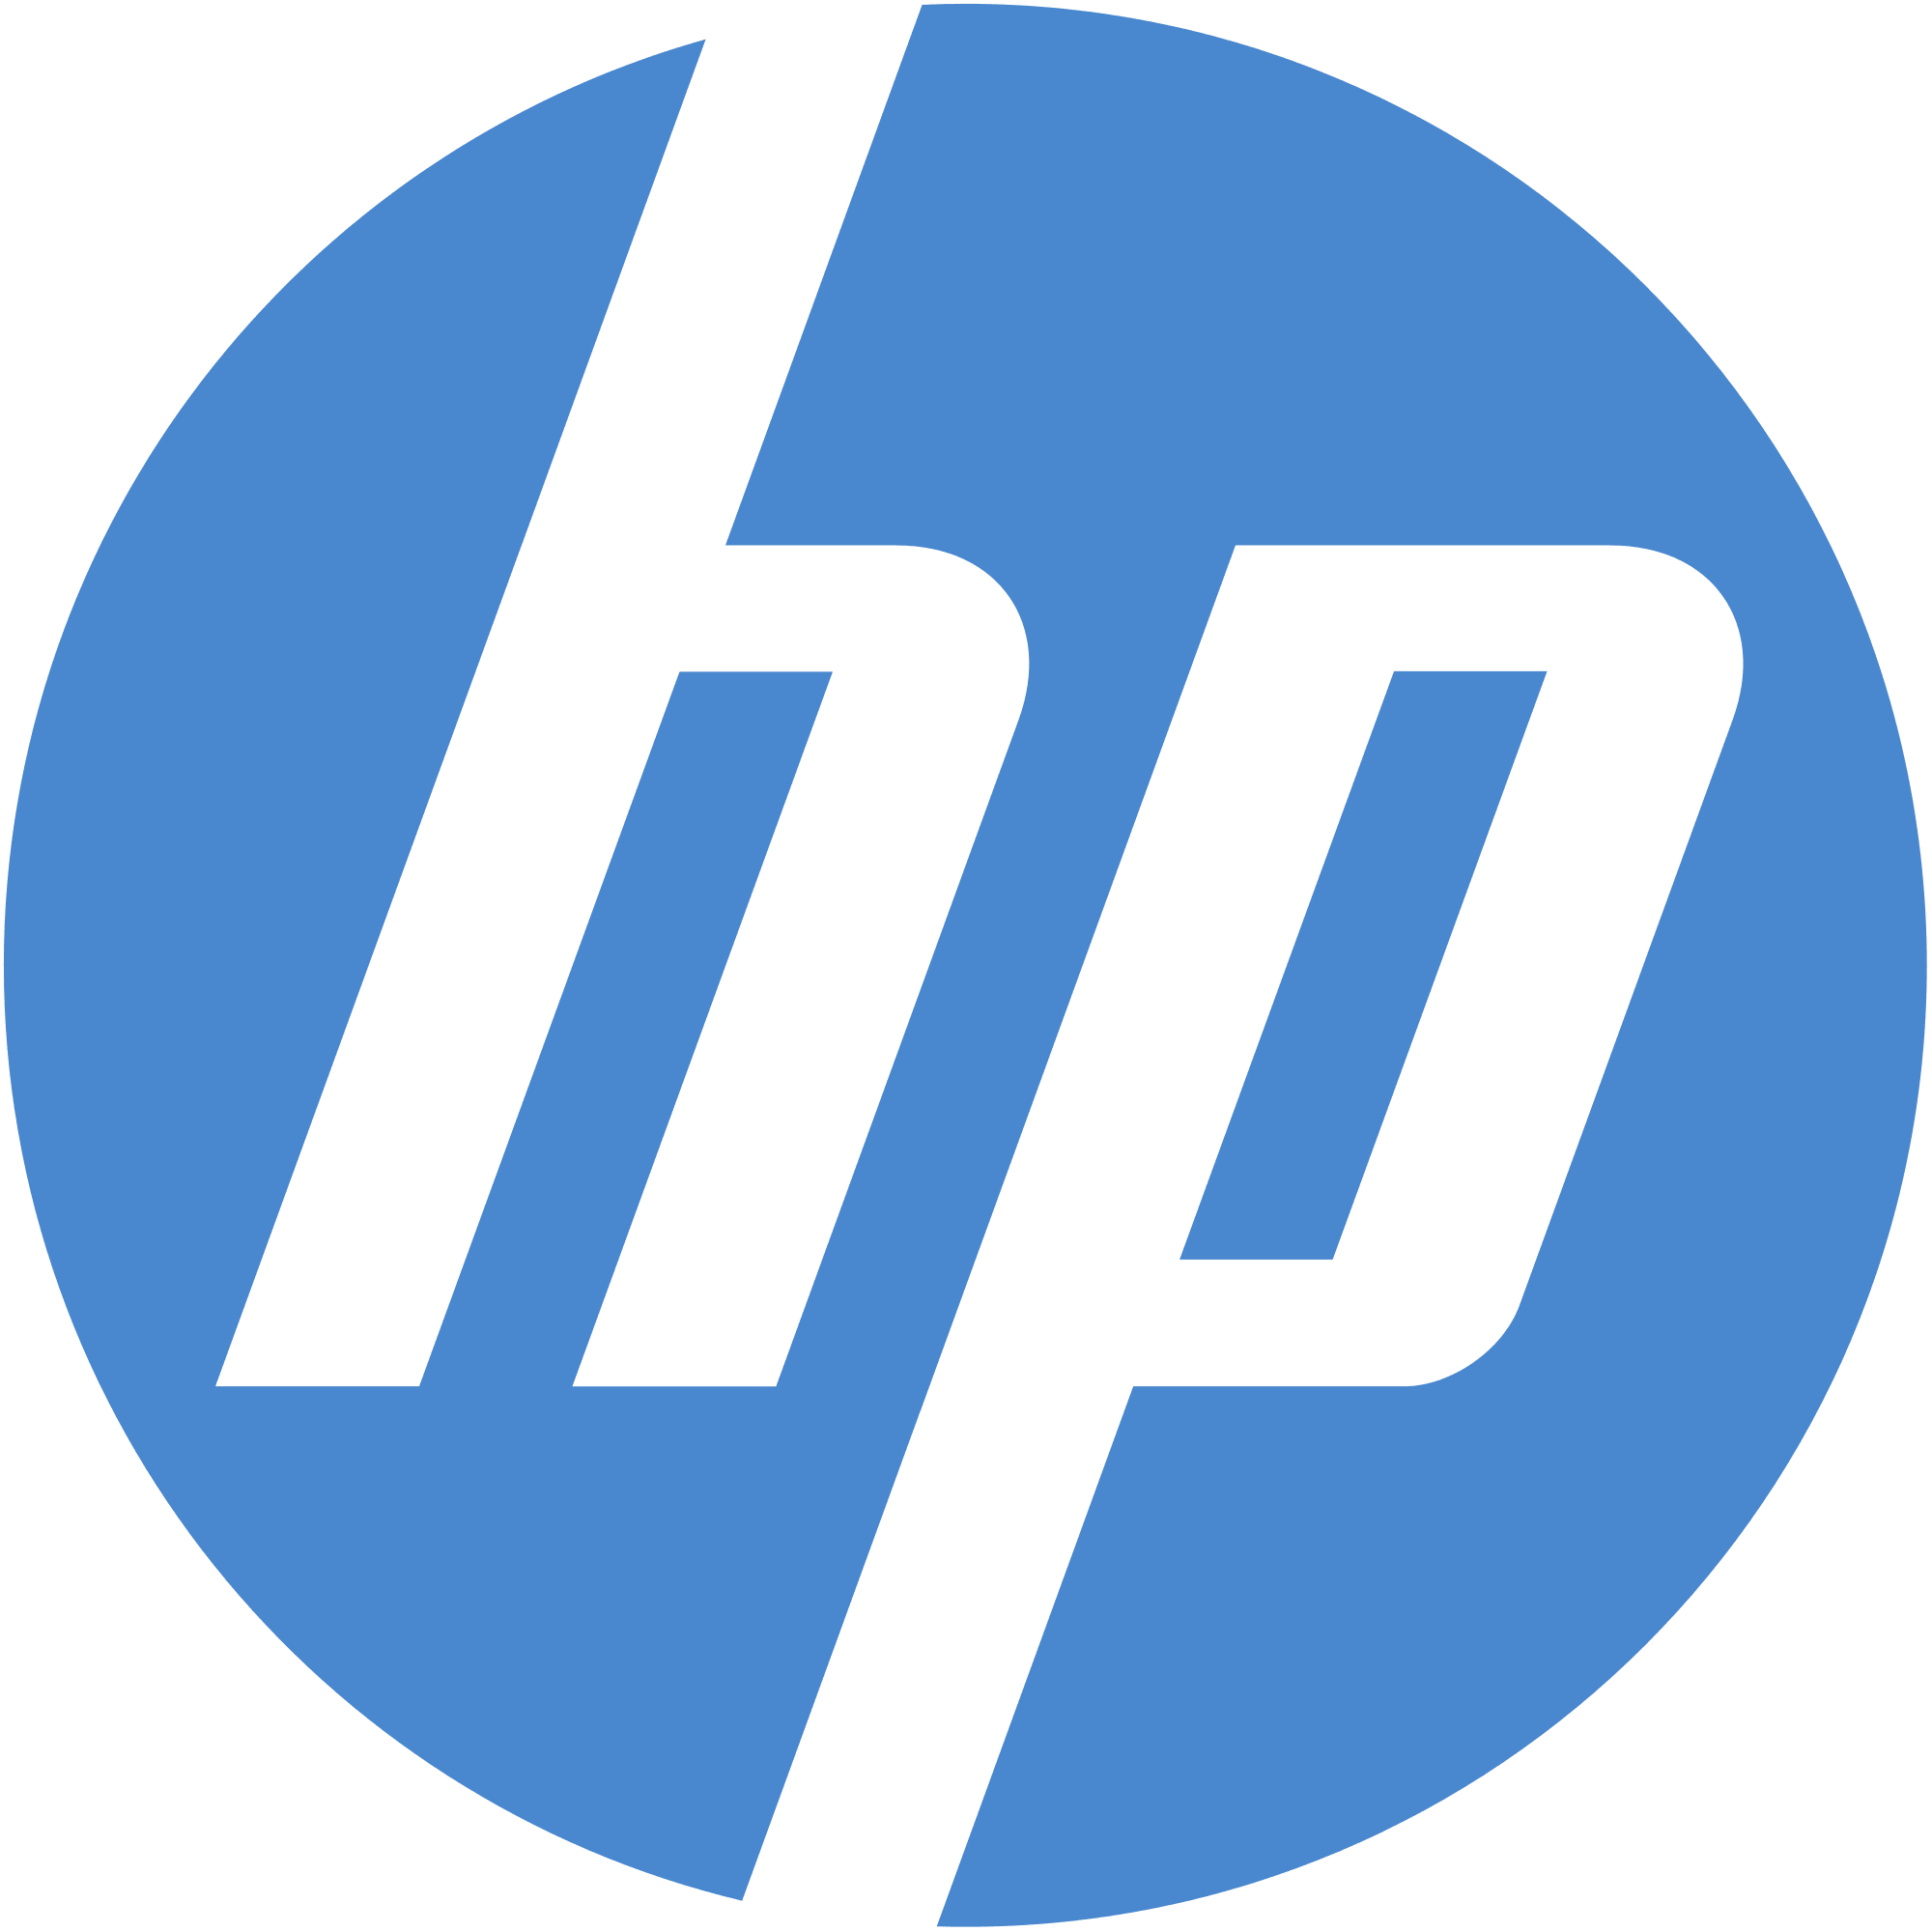 HP Officejet Pro 8620 Printer Driver